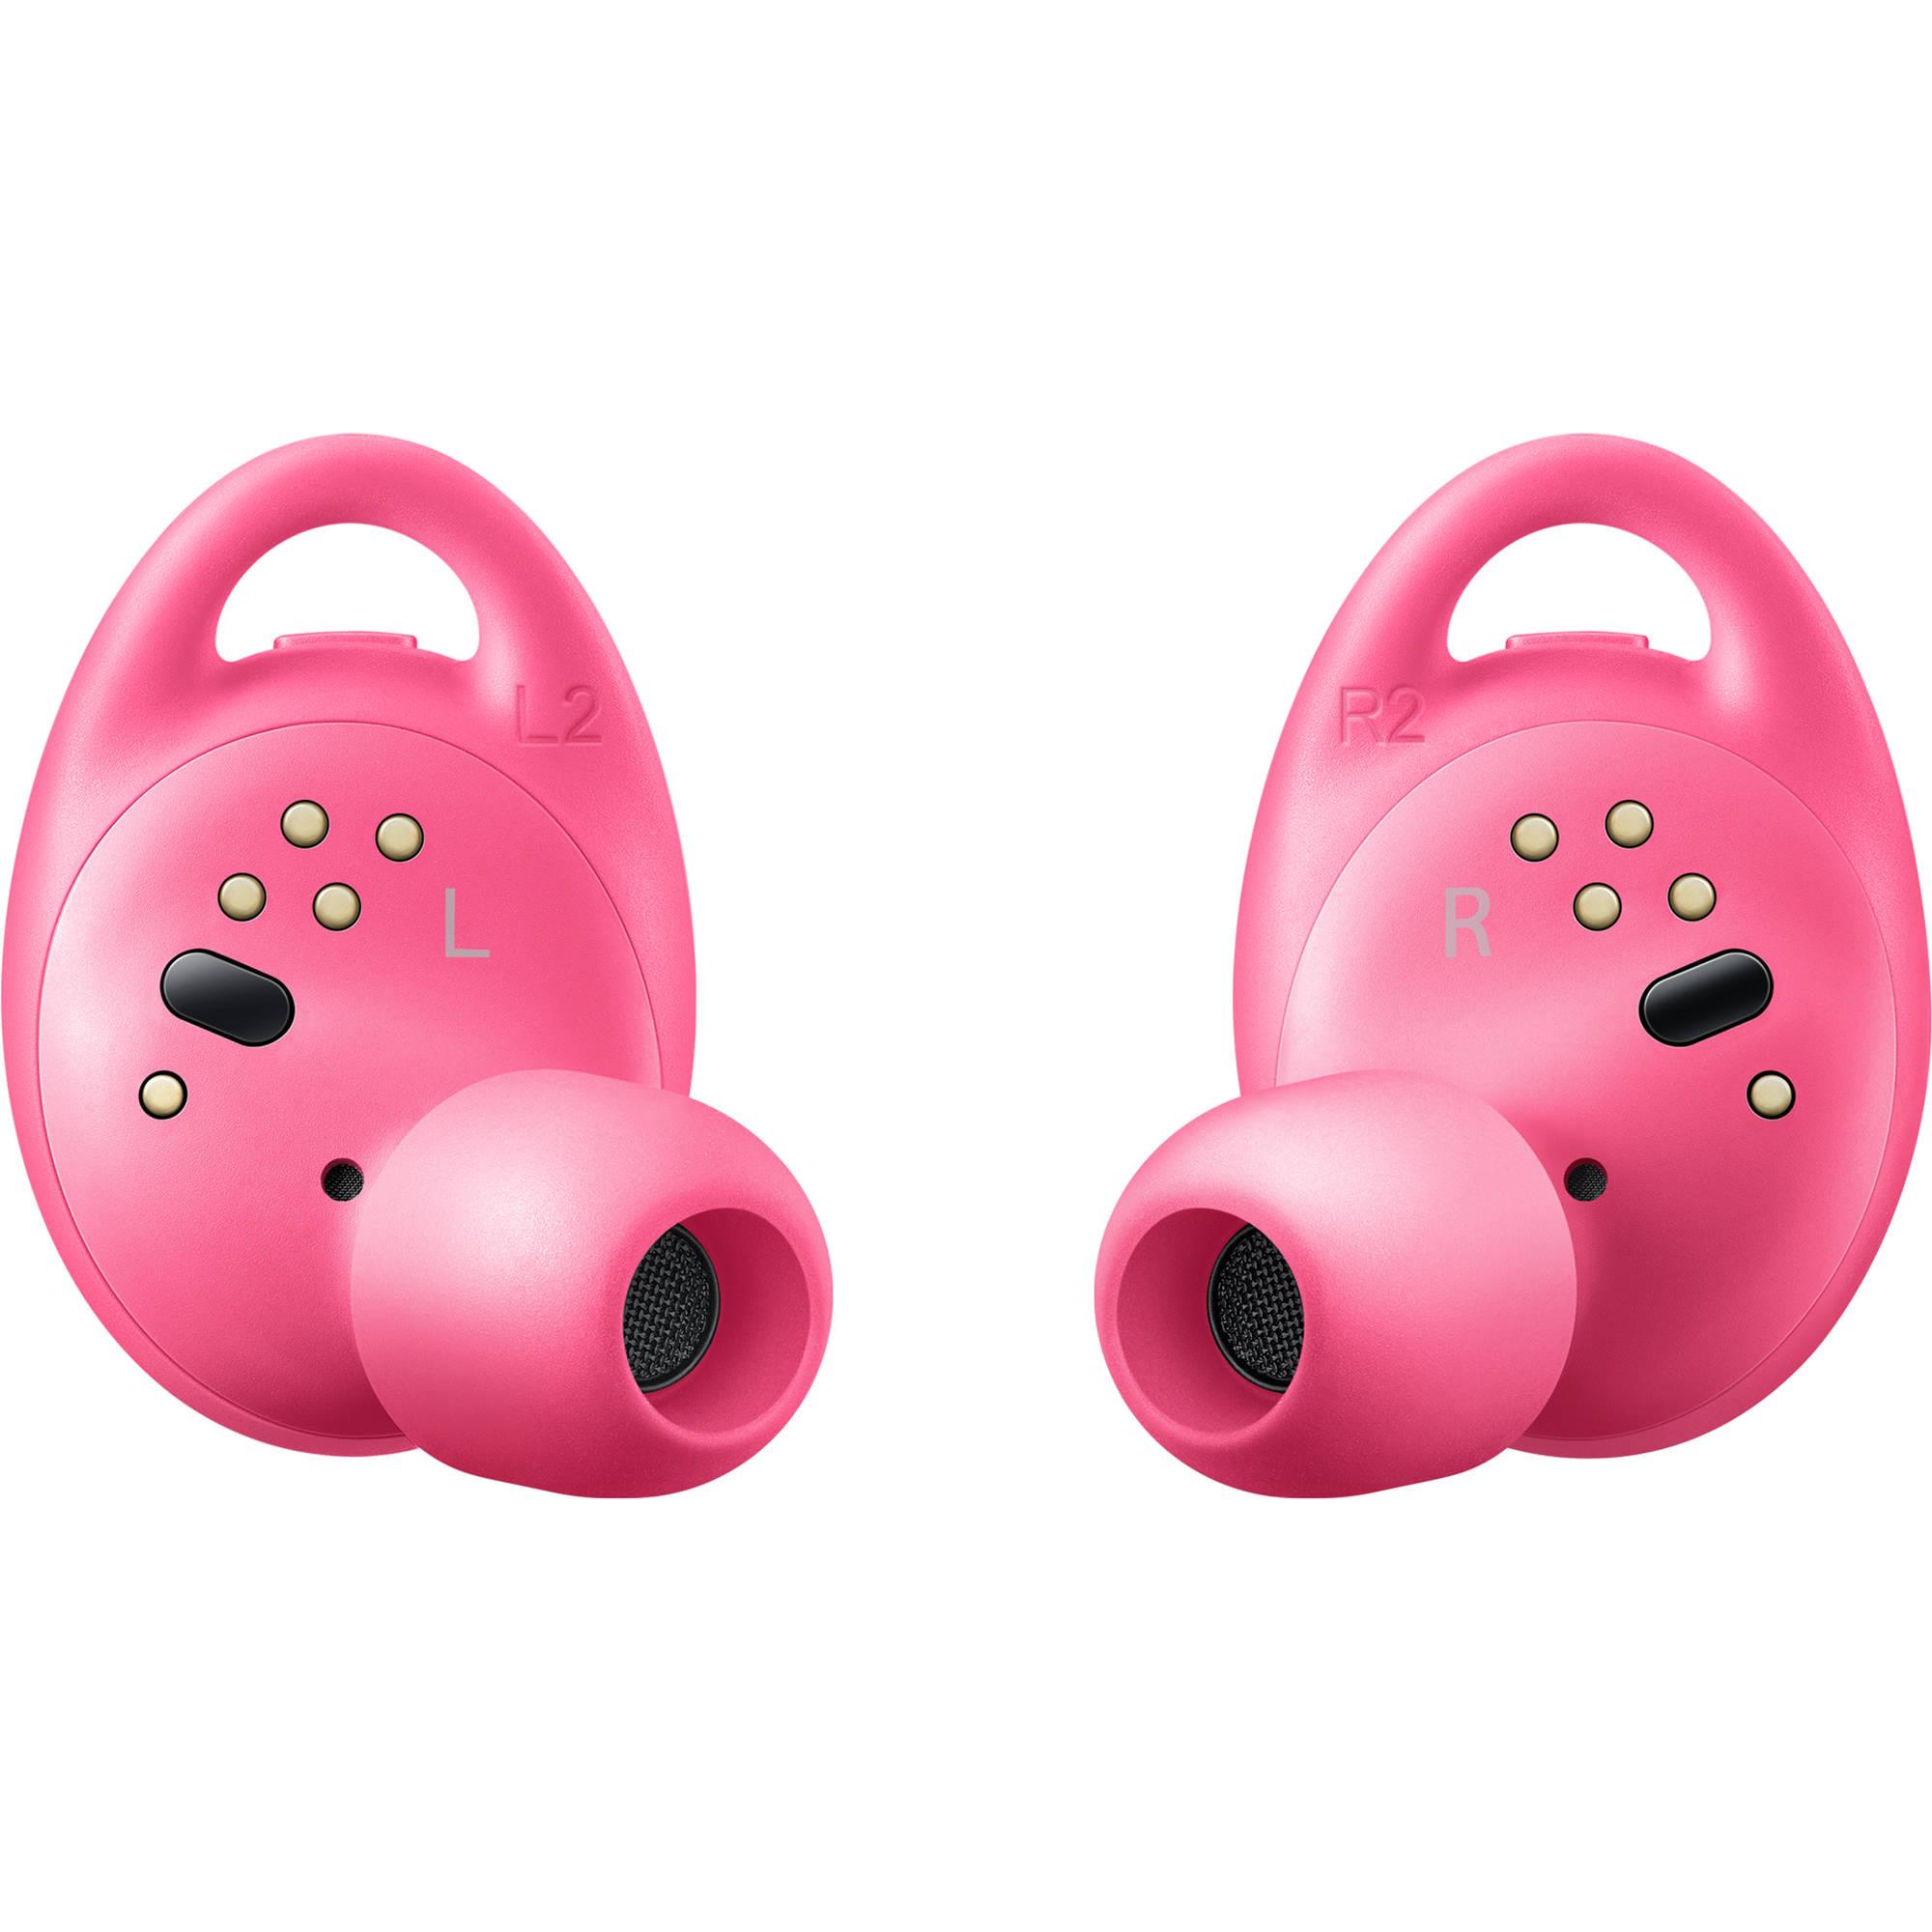 Samsung Iconx 2020 Review.Samsung Gear Iconx Wireless Earbuds 2018 Version Pink